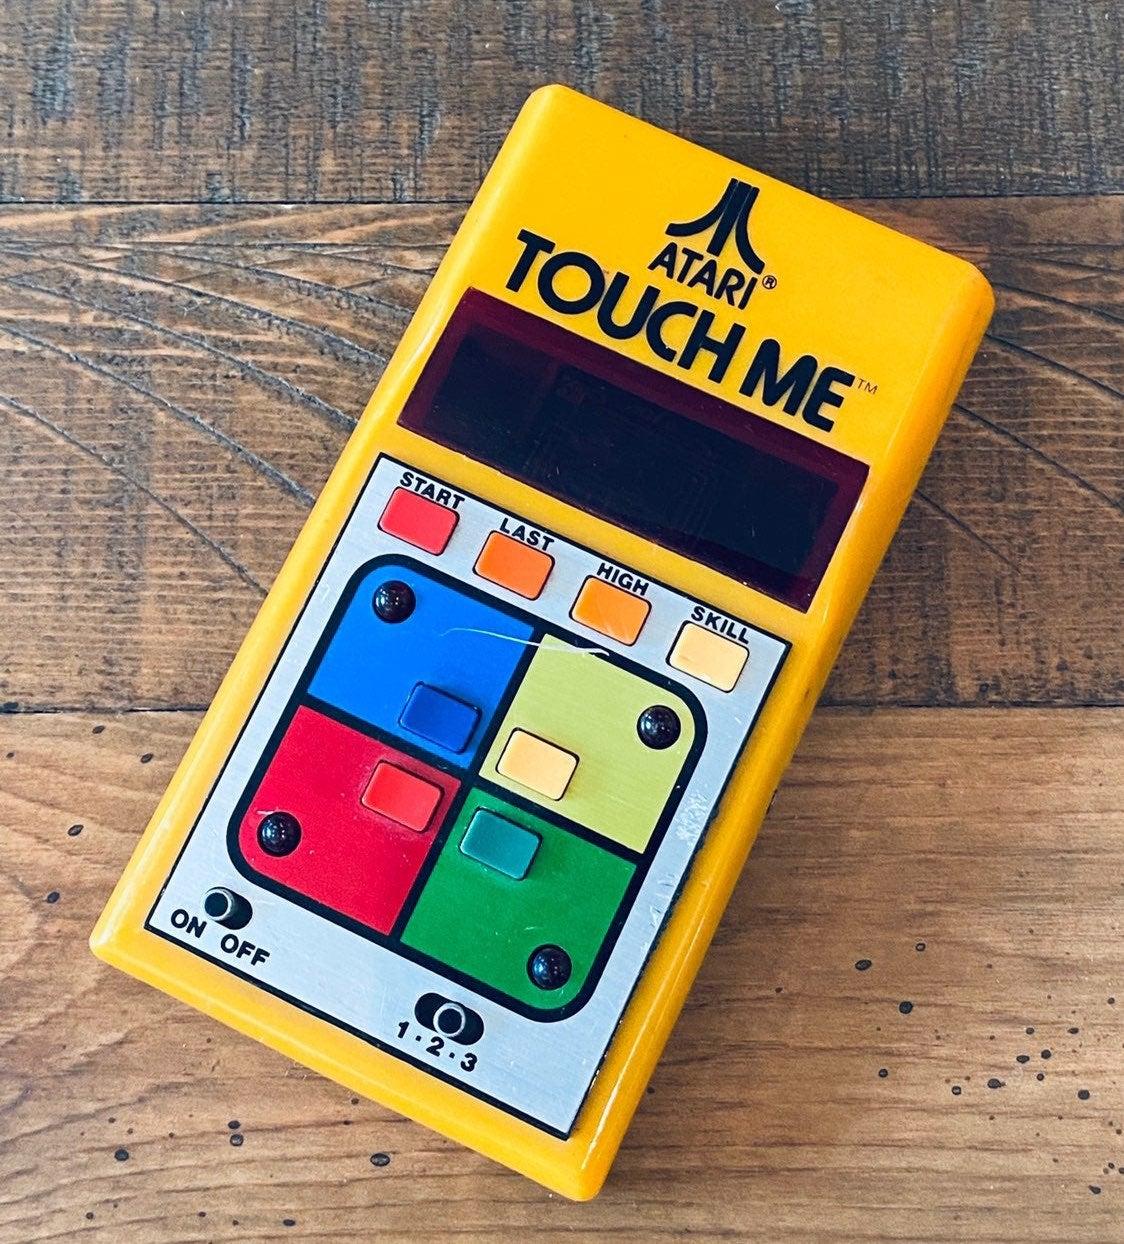 Atari Touch Me Game Electronic Handheld